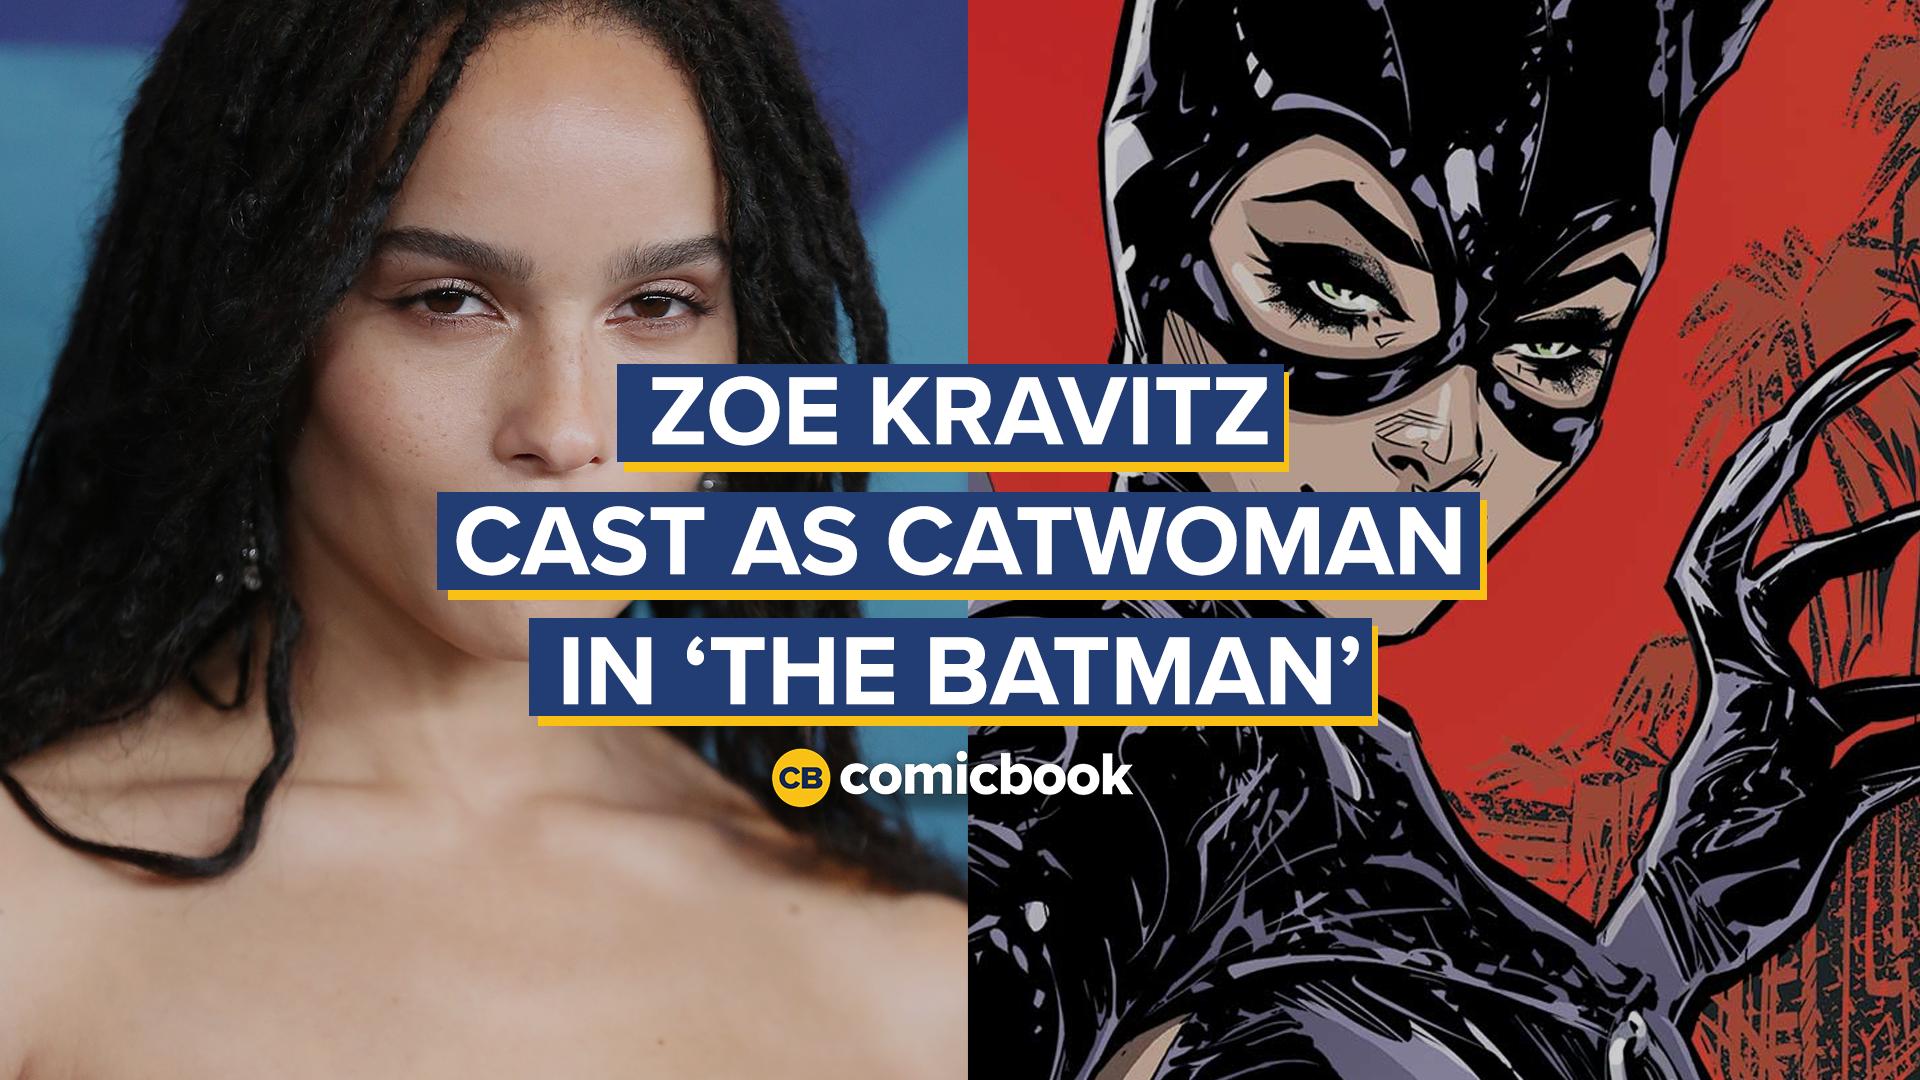 Zoe Kravitz Cast As Catwoman In Matt Reeves The Batman